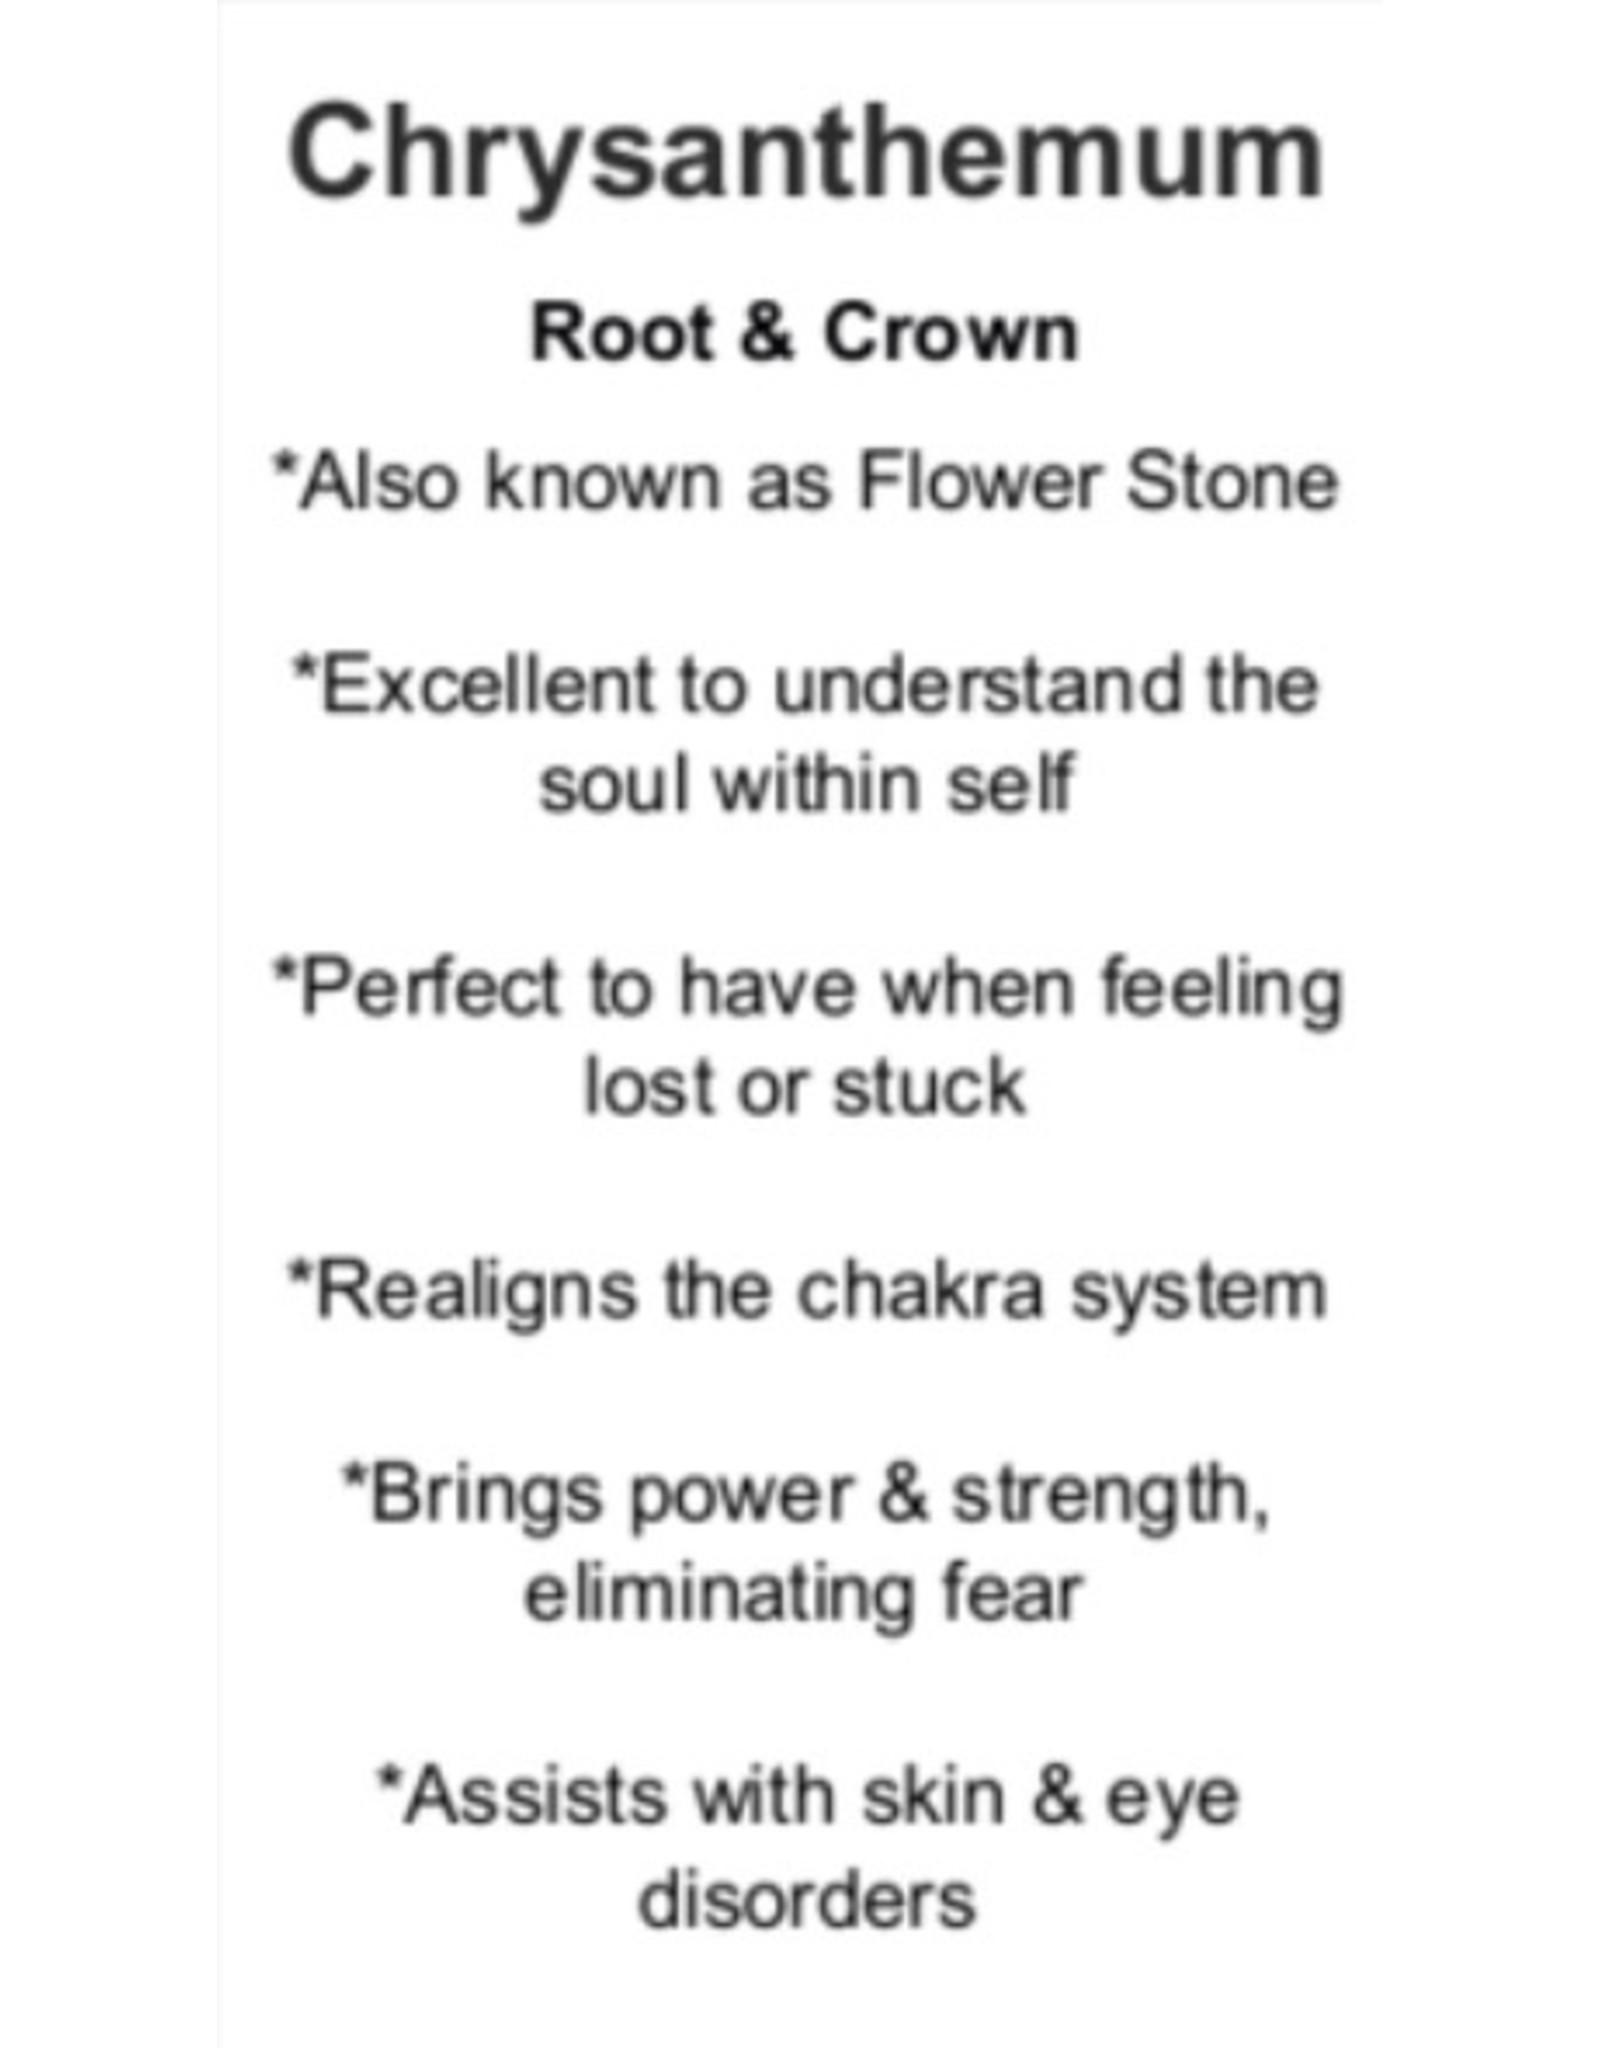 Chrysanthemum Palm/Pillow Stone